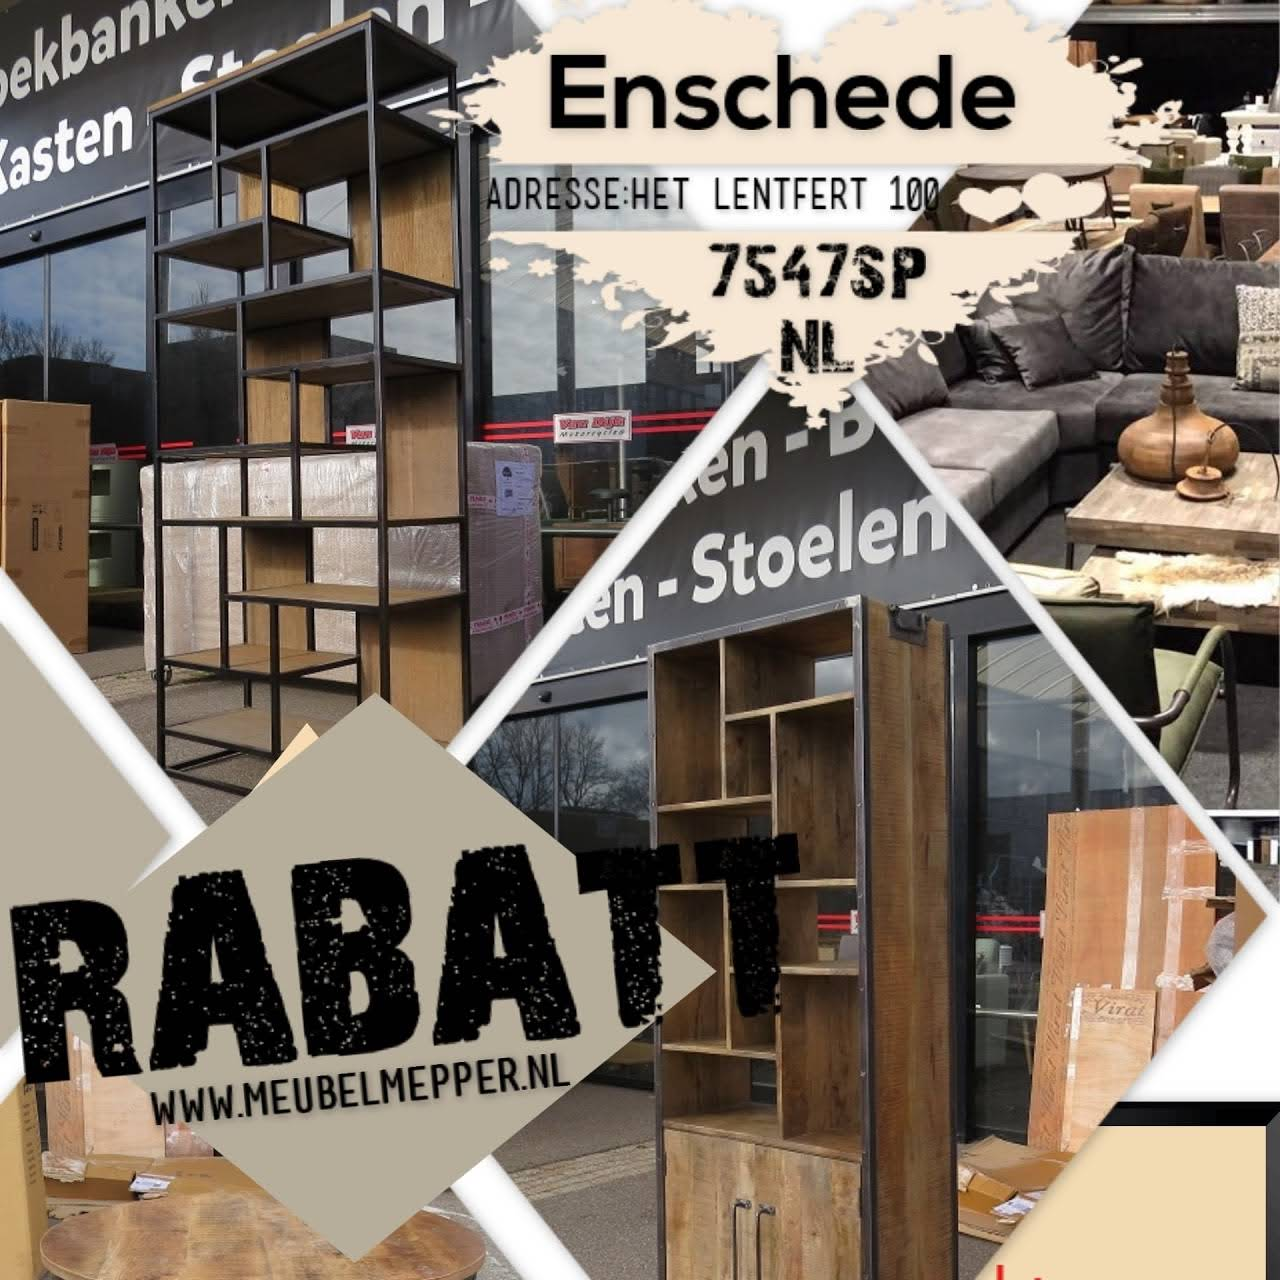 Design Stoelen Enschede.Jisk2ocuo0ghmm